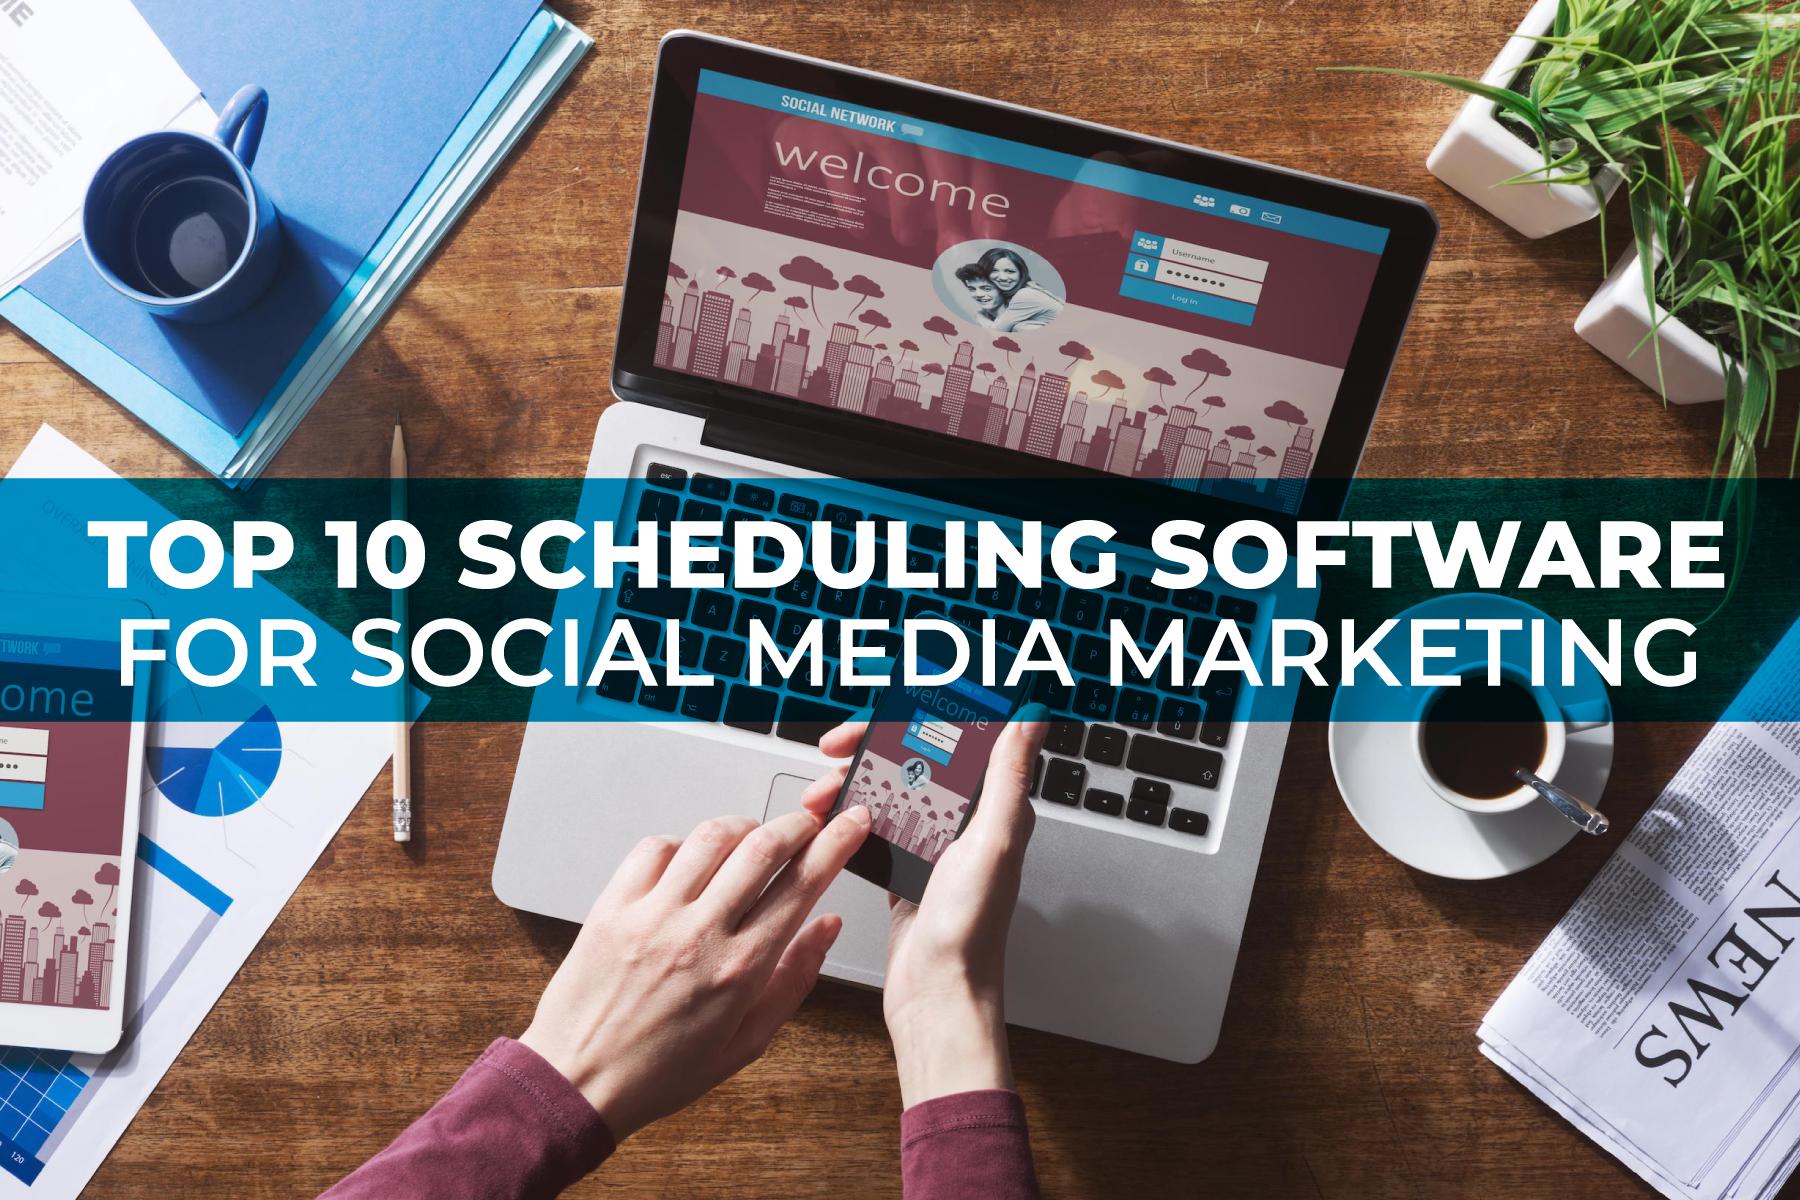 Top 10 Scheduling Software for Social Media Marketing Header